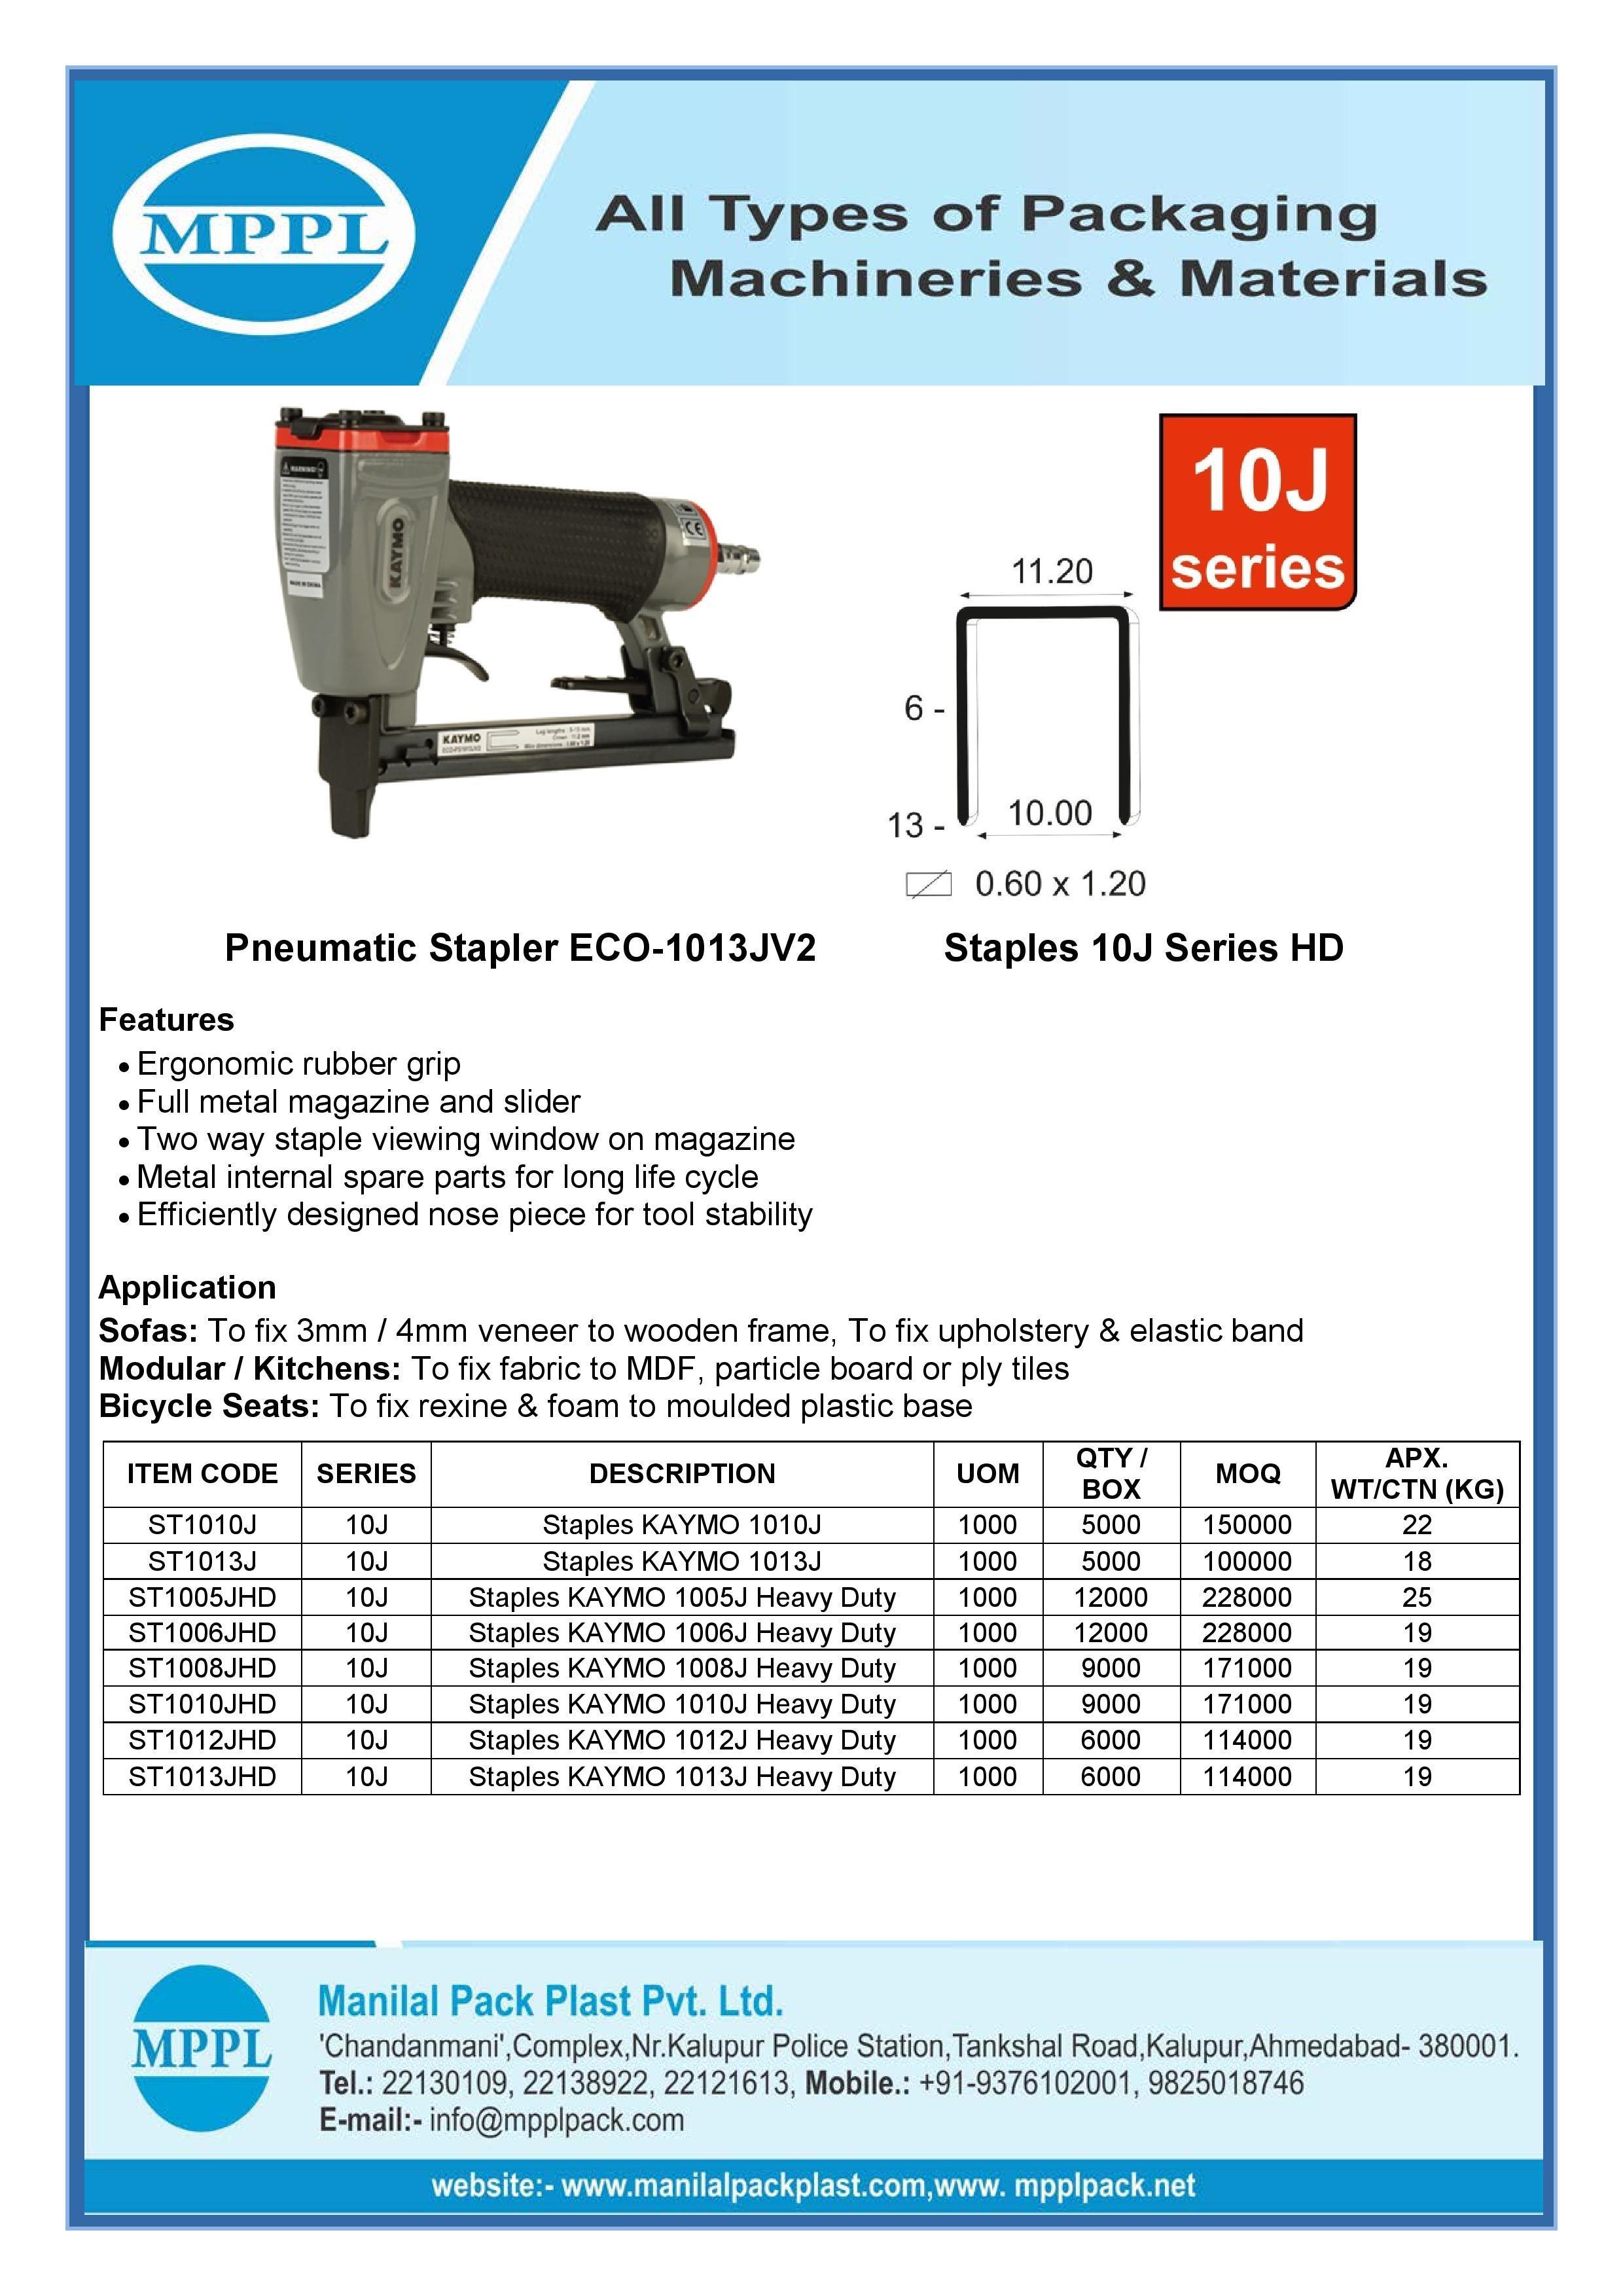 Pneumatic Stapler ECO-1013JV2